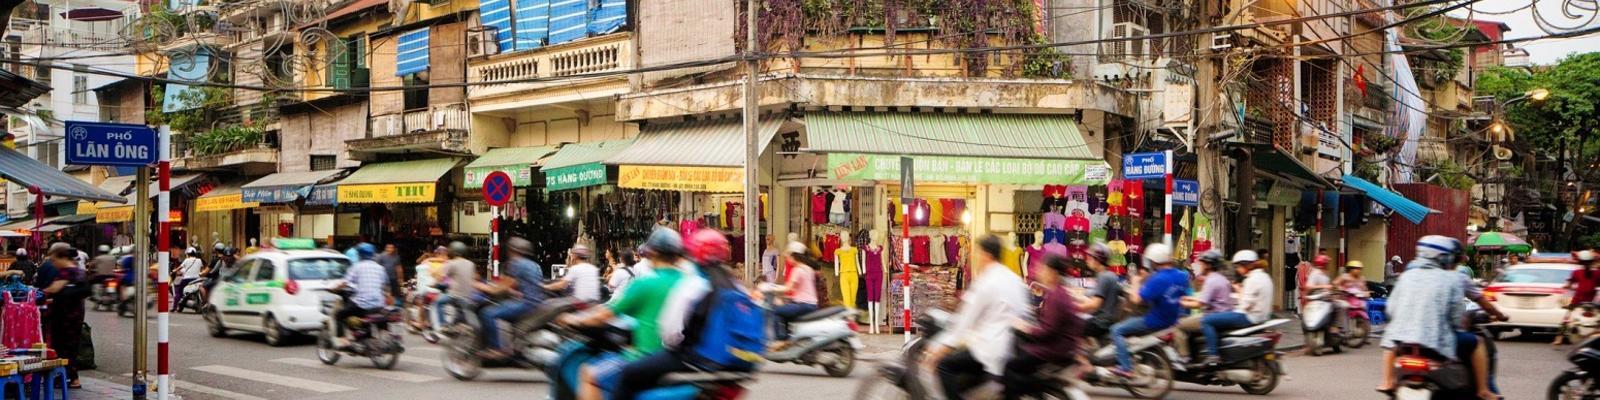 vietnamese street